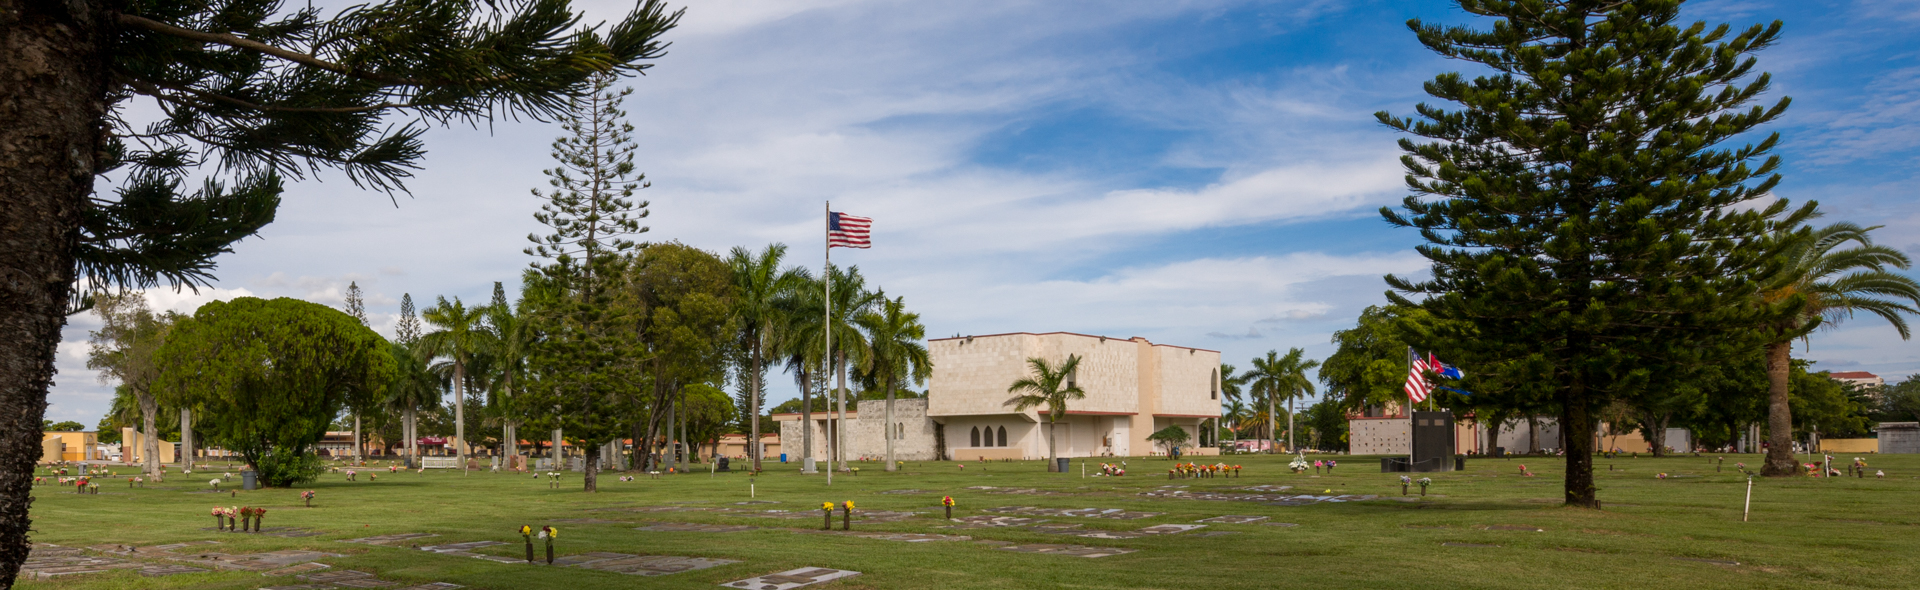 Graceland Memorial Park Cemetery - North